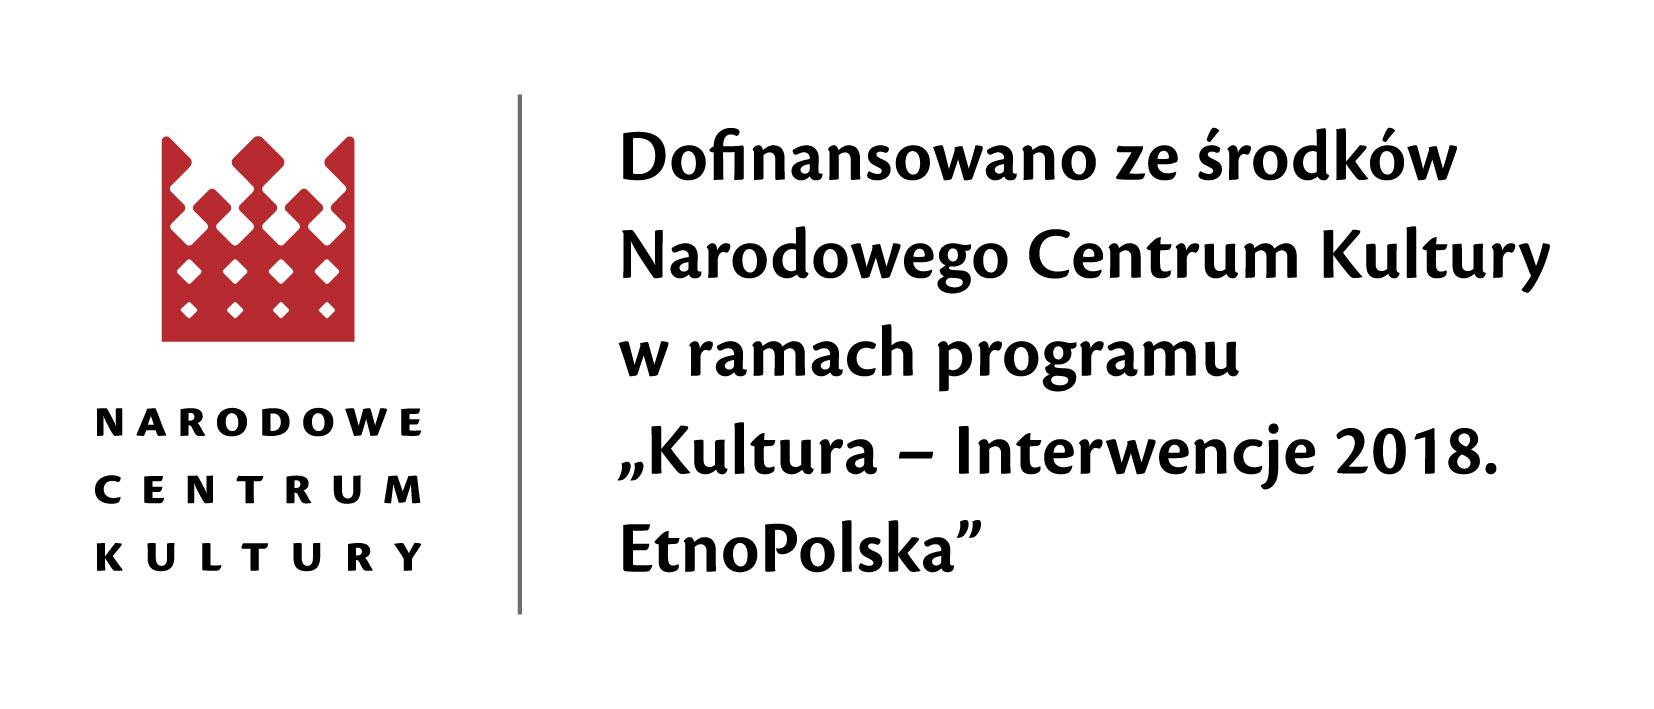 NCK_Kult_Interw_2018_ETNO_RGB